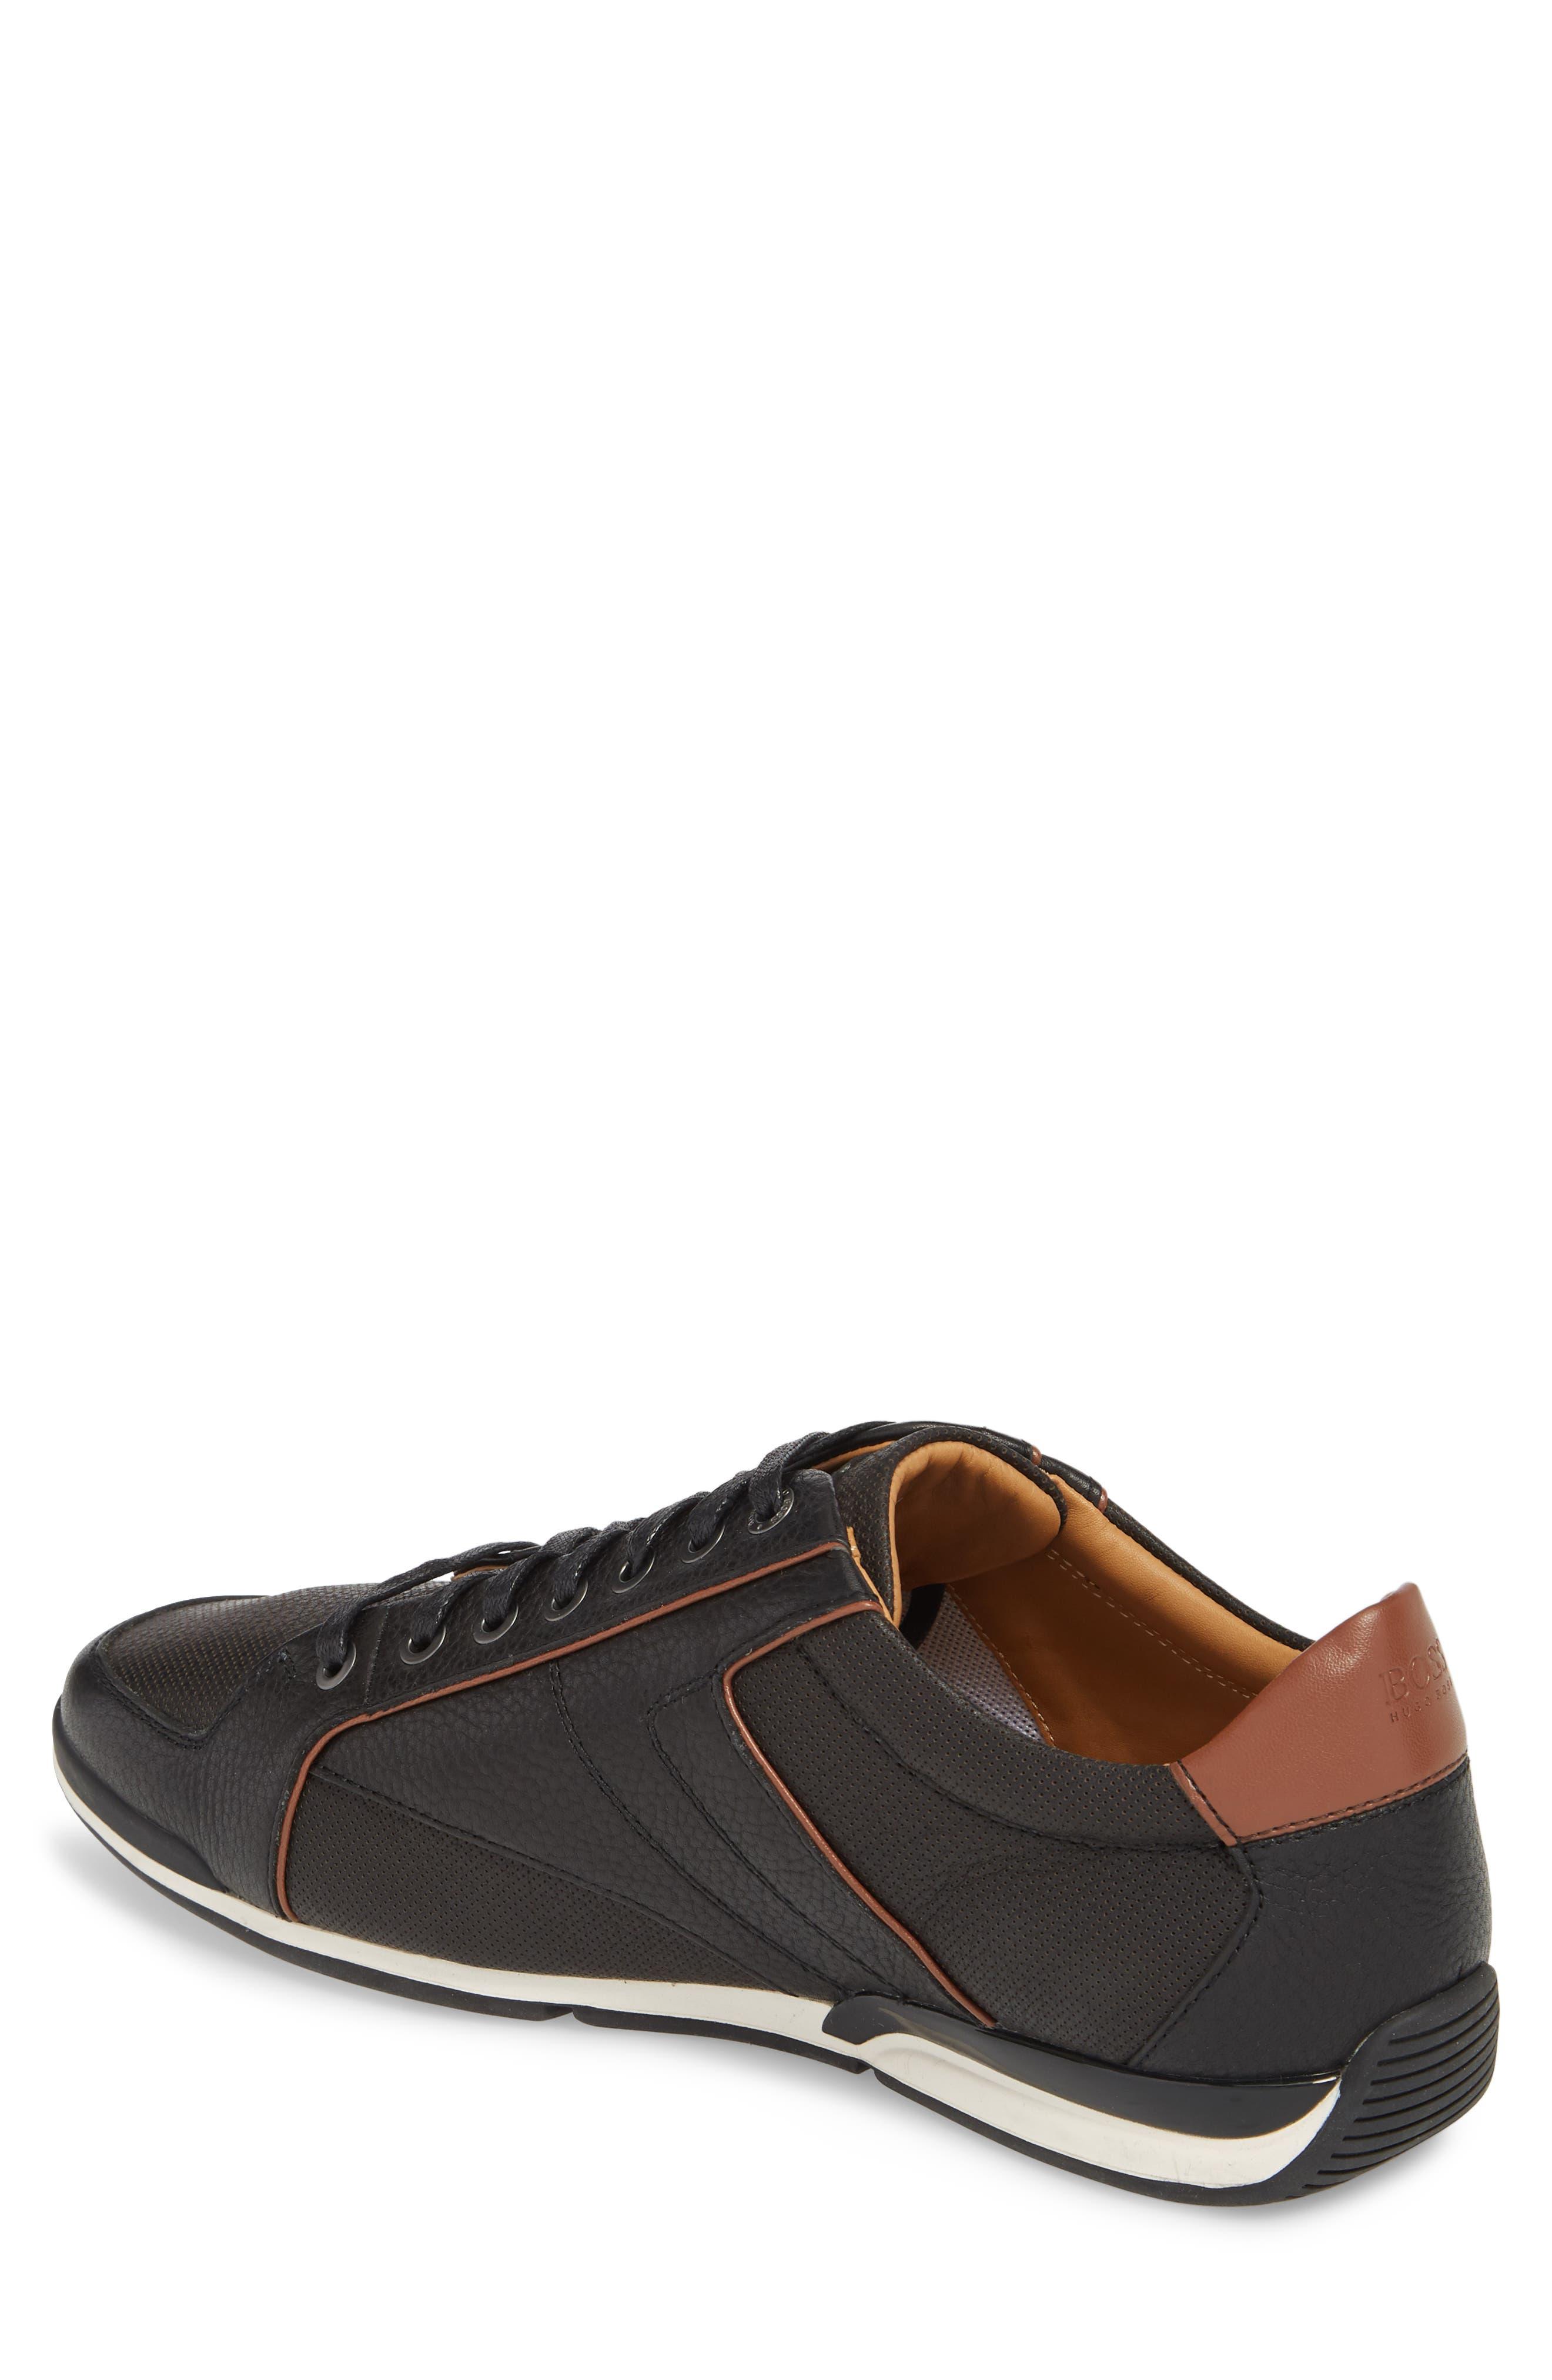 Hugo Boss Saturn Low Top Sneaker,                             Alternate thumbnail 2, color,                             BLACK LEATHER